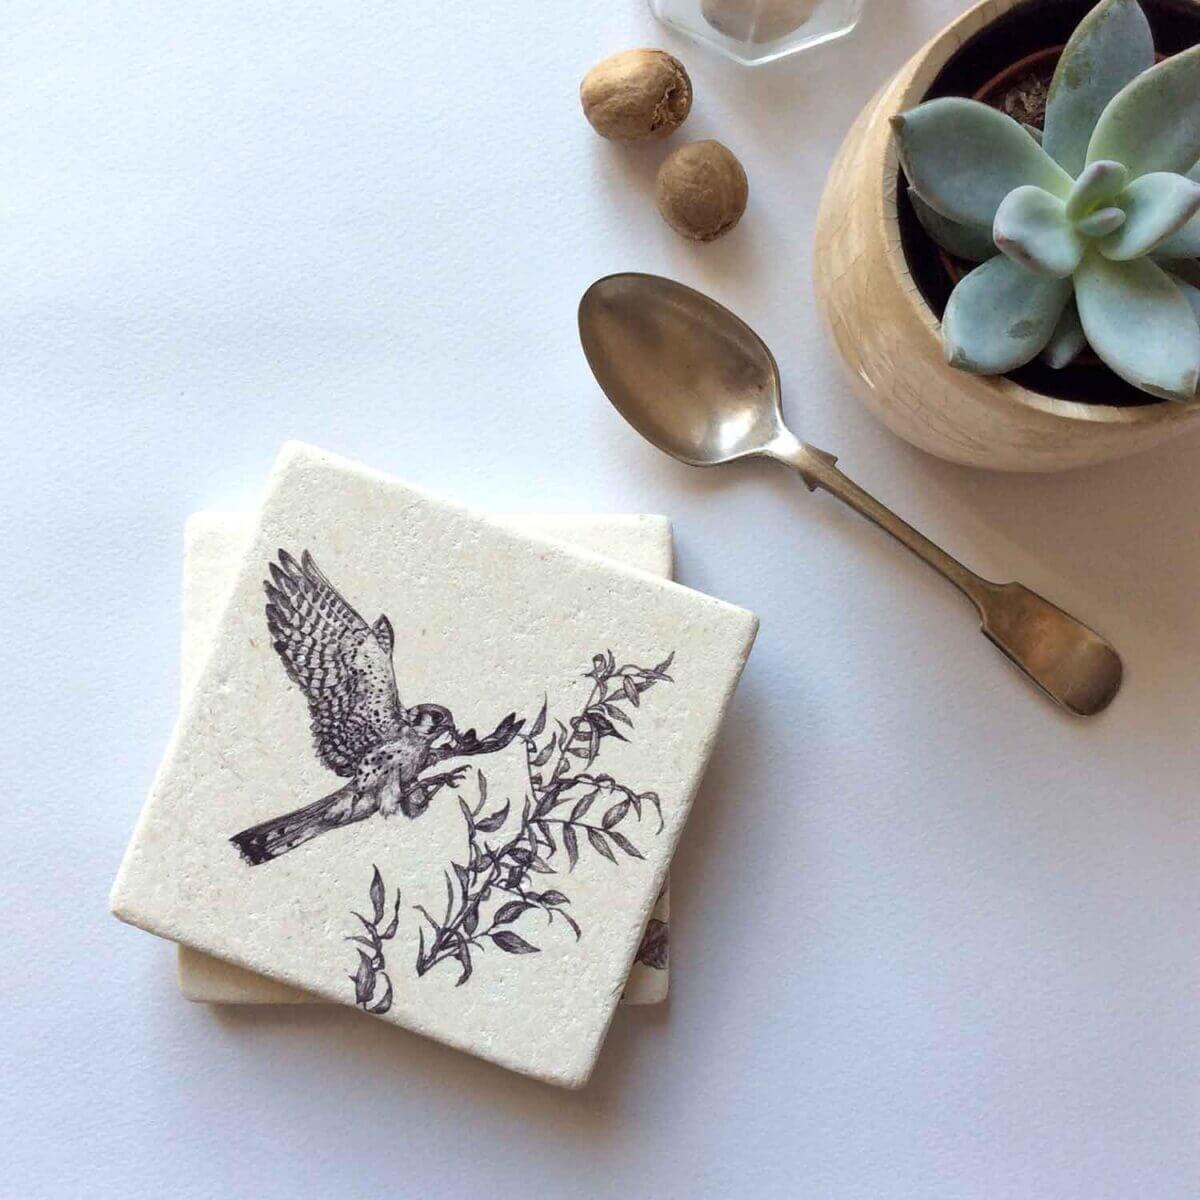 American-Kestrel-Natural-Coaster-Styled-Sky-Siouki